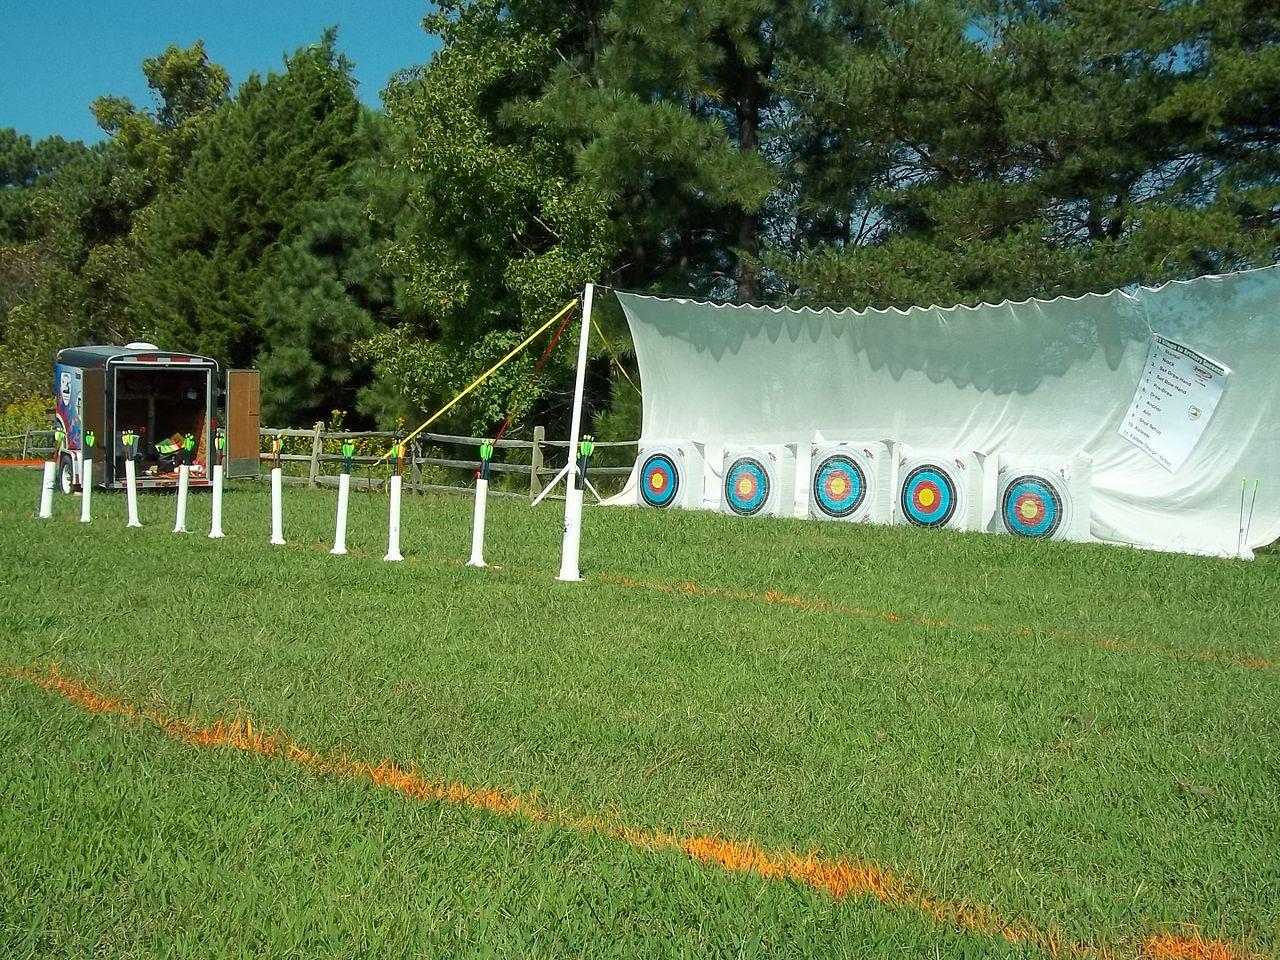 Indoor Outdoor House File Archery Range 8019644987 Jpg Wikimedia Commons